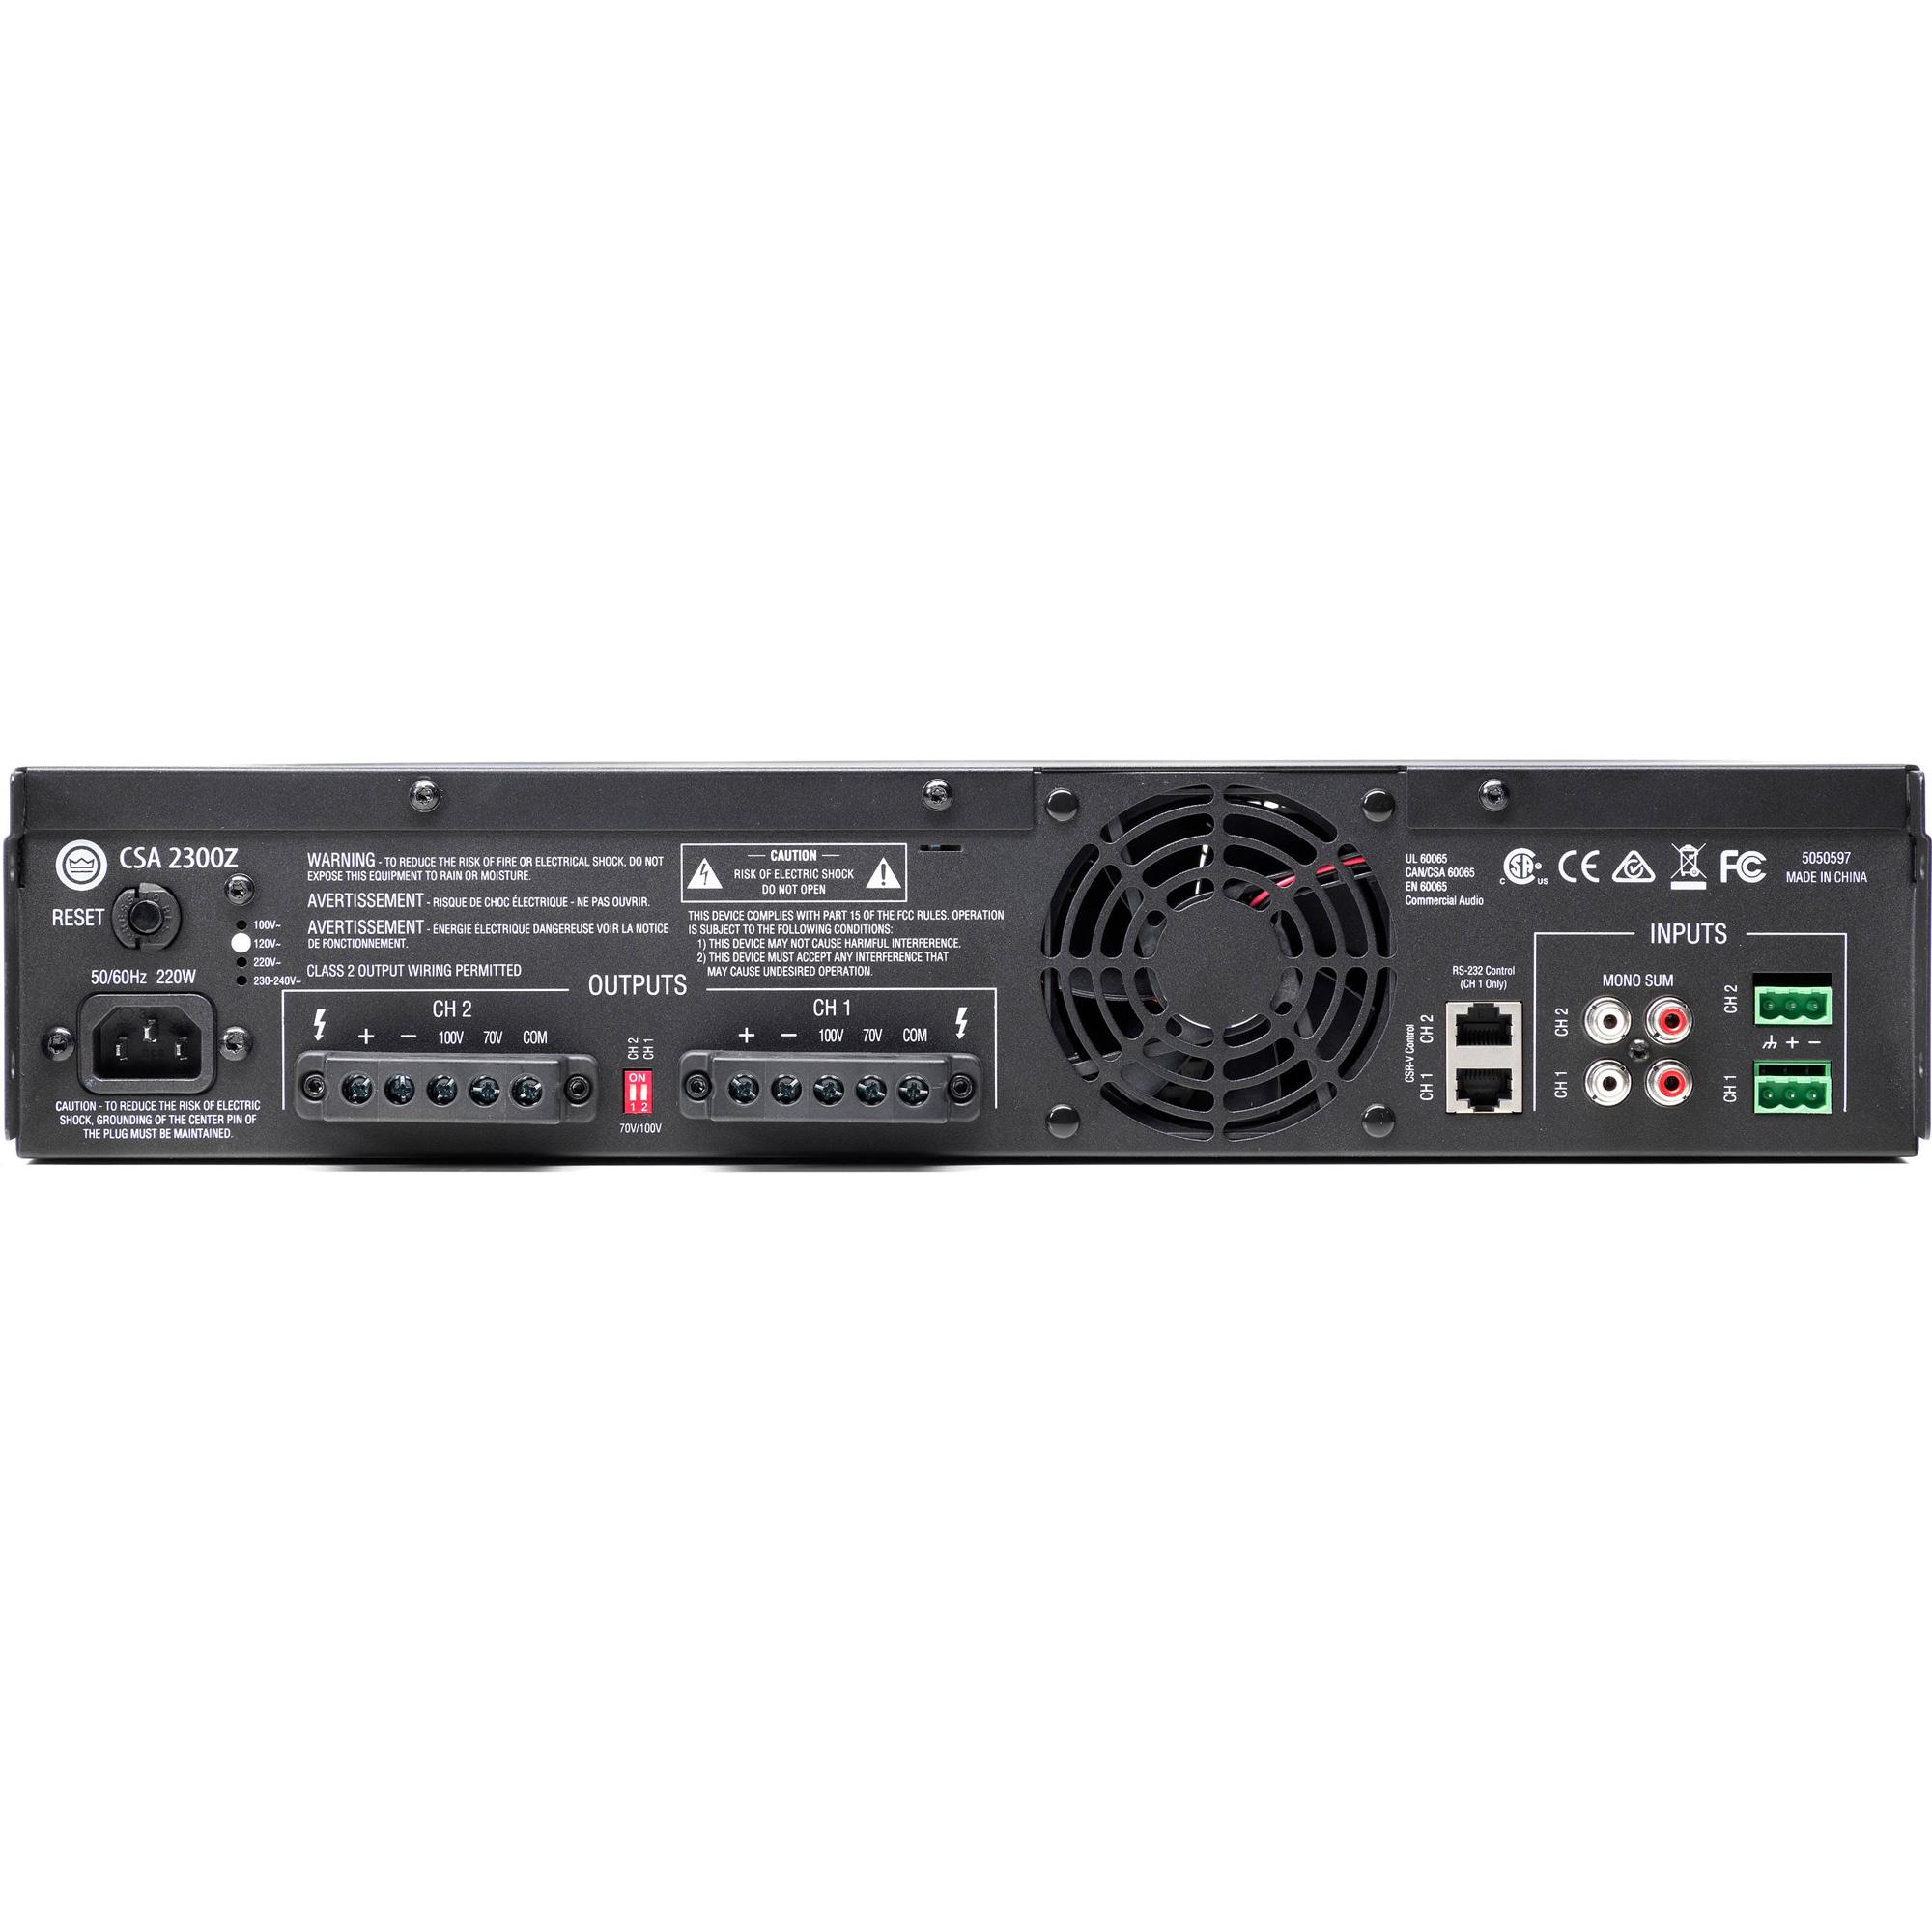 Jbl Csa2300z Csa 2300z Dual Channel 300w Amplifier